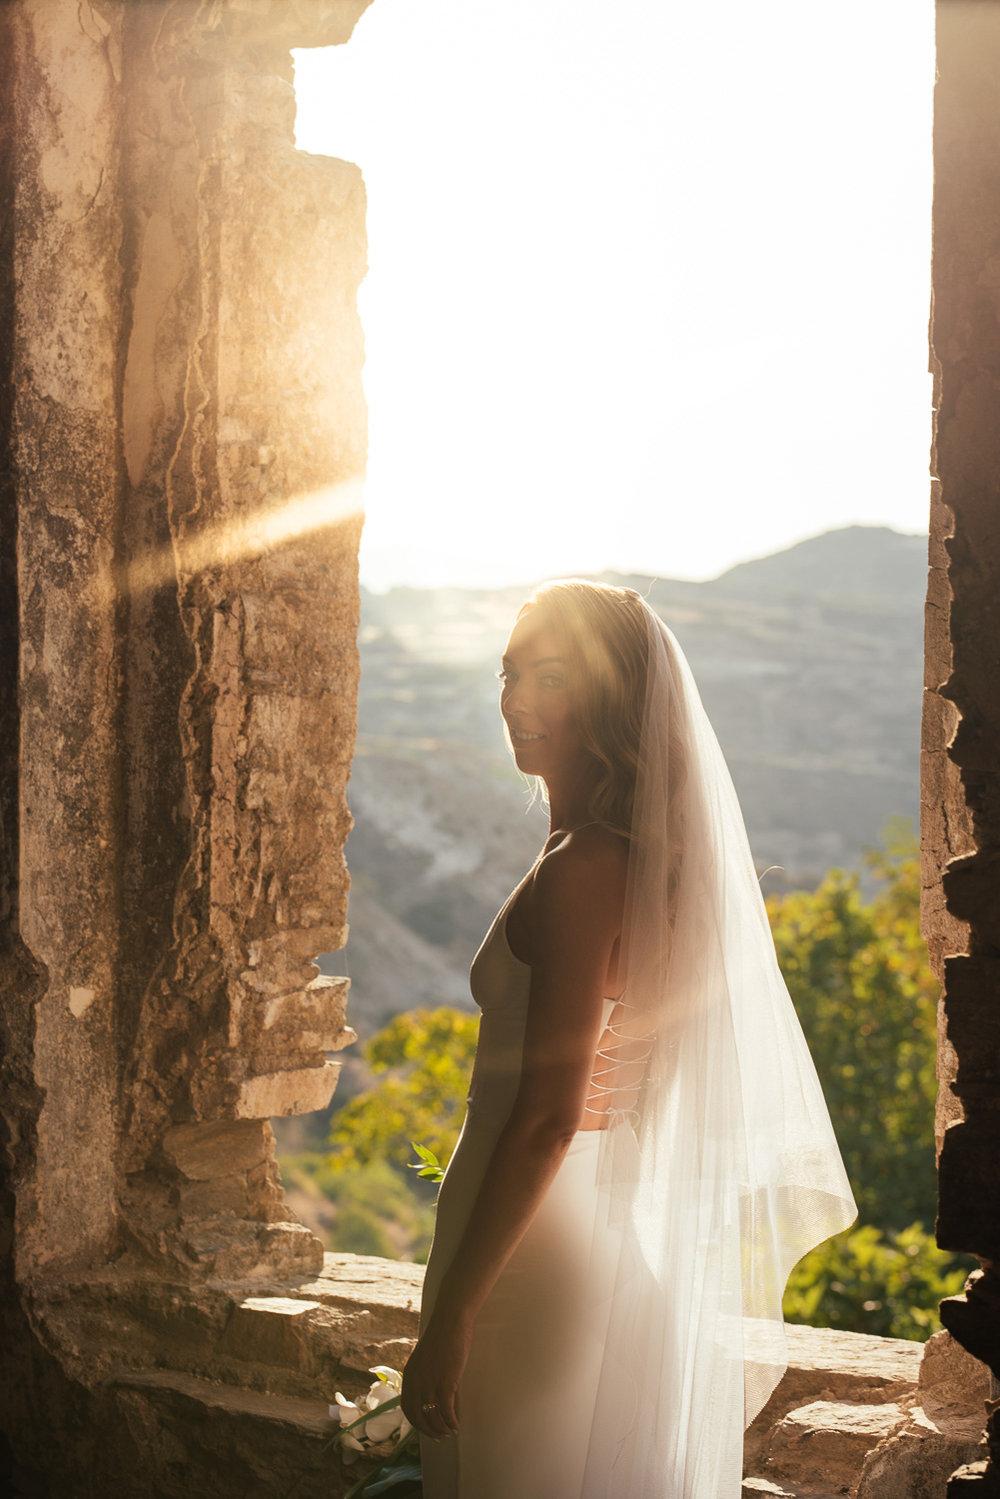 Naxos-Wedding-Marq-Riley-44-lorraine-ciaran-naxos-0326-Q1P_7426-.jpg